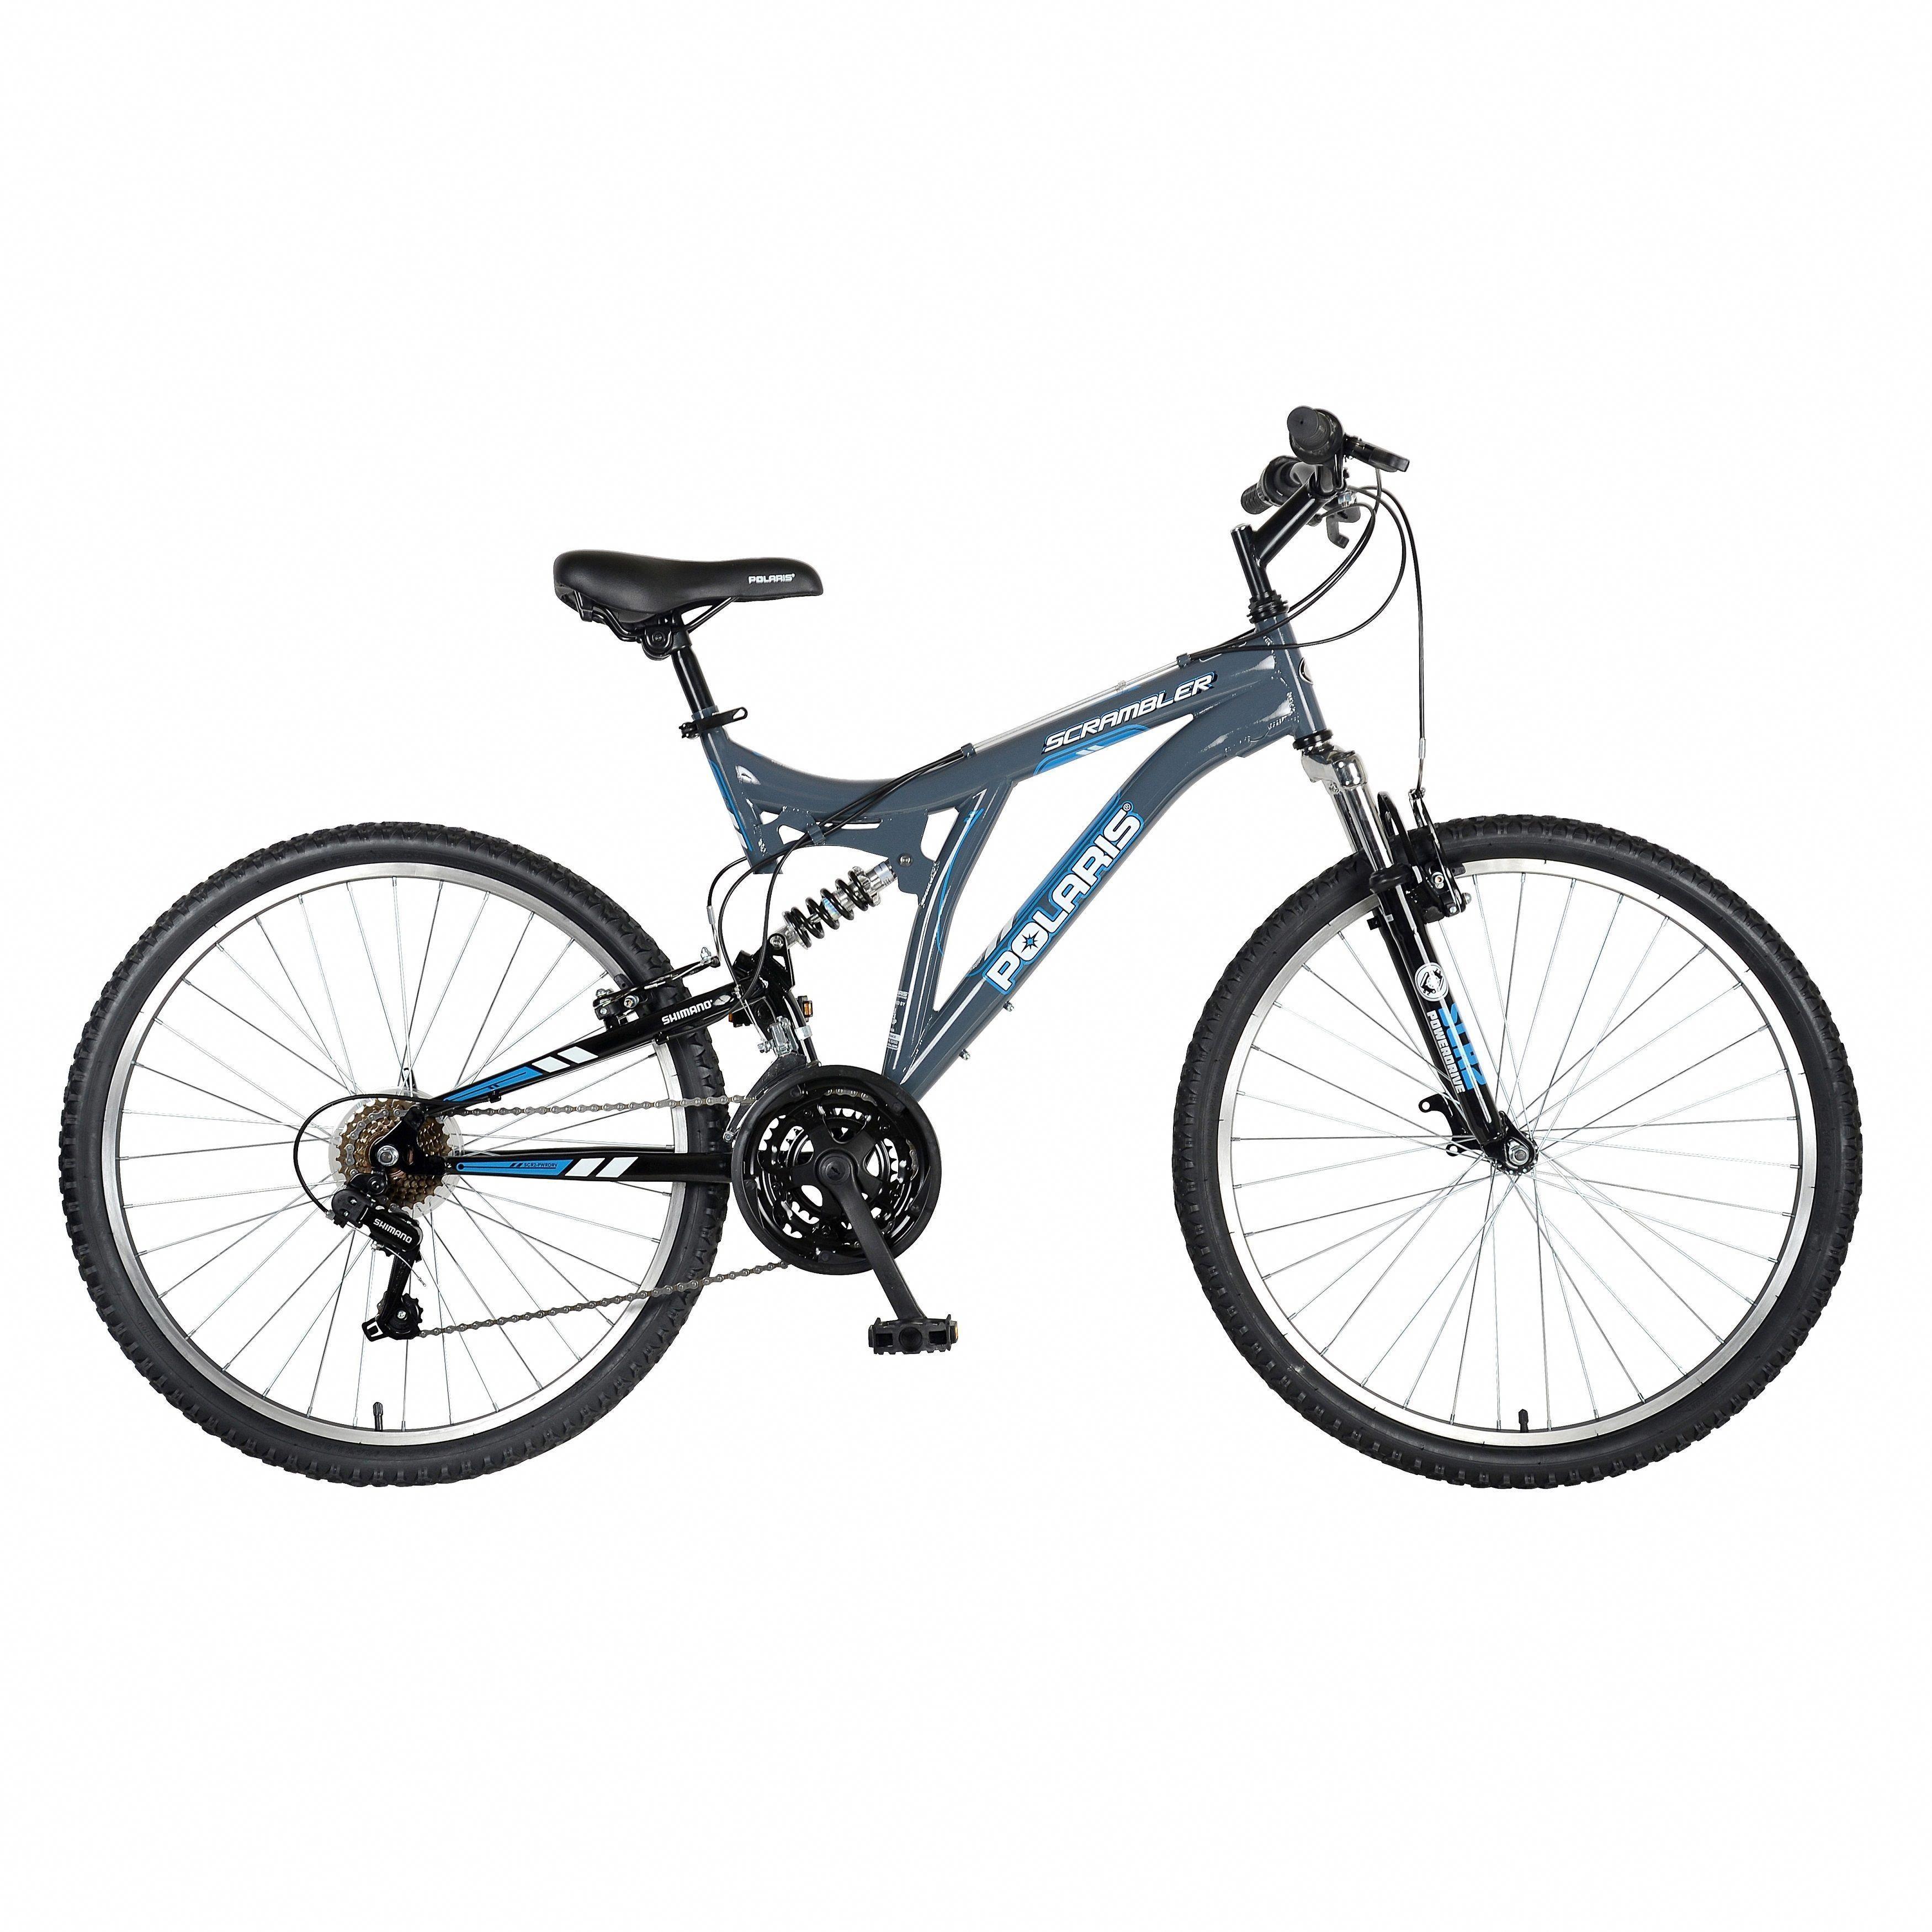 Polaris Scrambler 26 Full Suspension Bicycle Scrambler 26 Full Suspension Bicycle Color Silve Full Suspension Mountain Bike Vintage Mountain Bike Man Bike